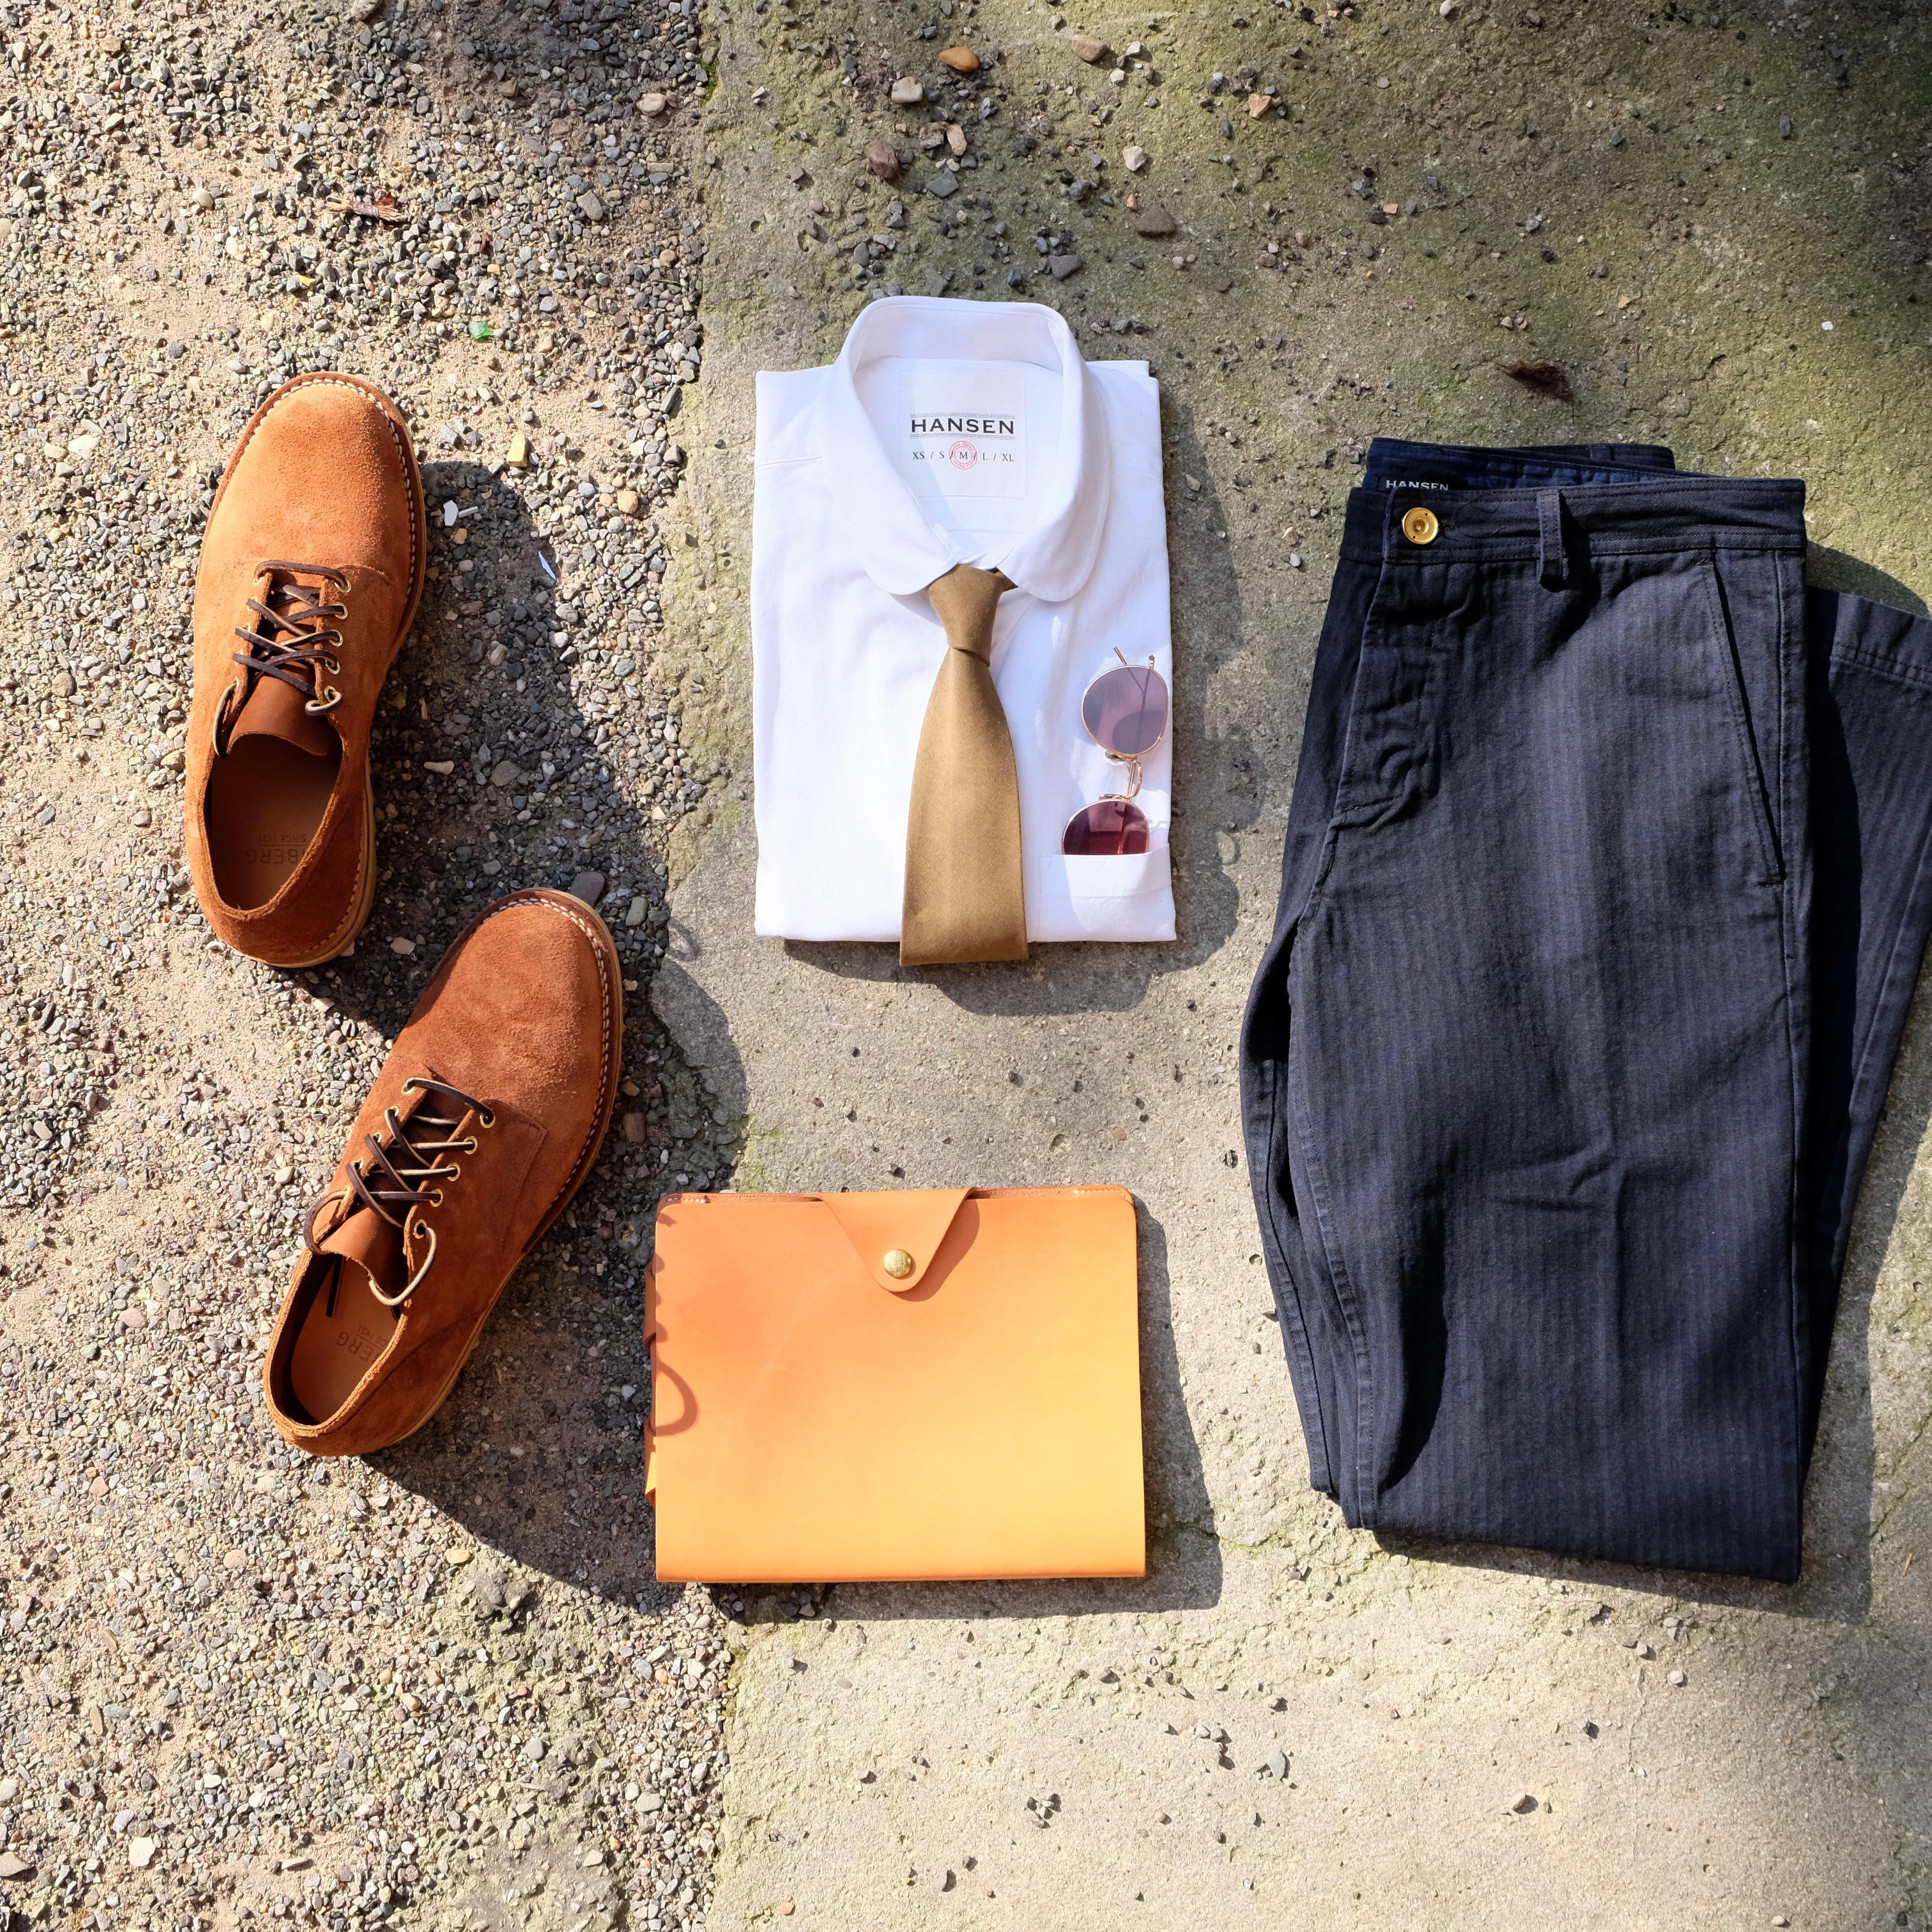 outfit-hansen-hemd-hose-herringbone-viberg-oxford-eyevan-superior-labor